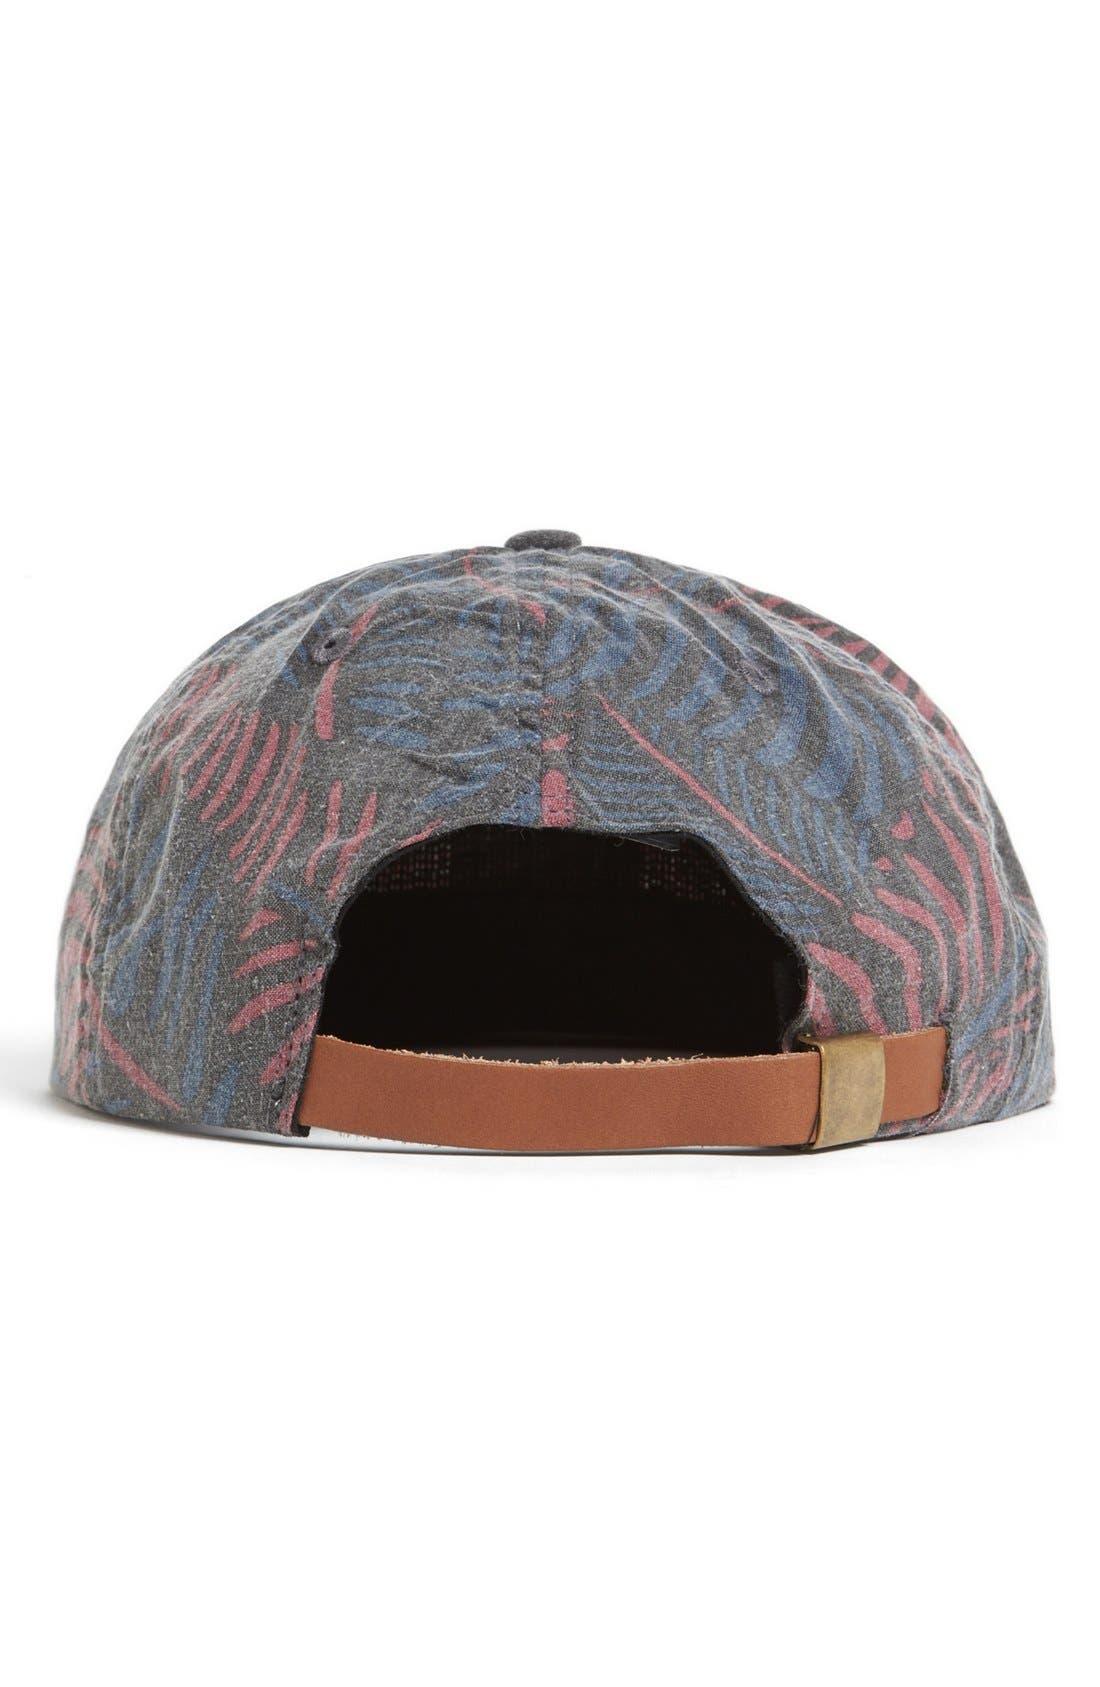 Alternate Image 2  - Katin 'Fronds' Cap